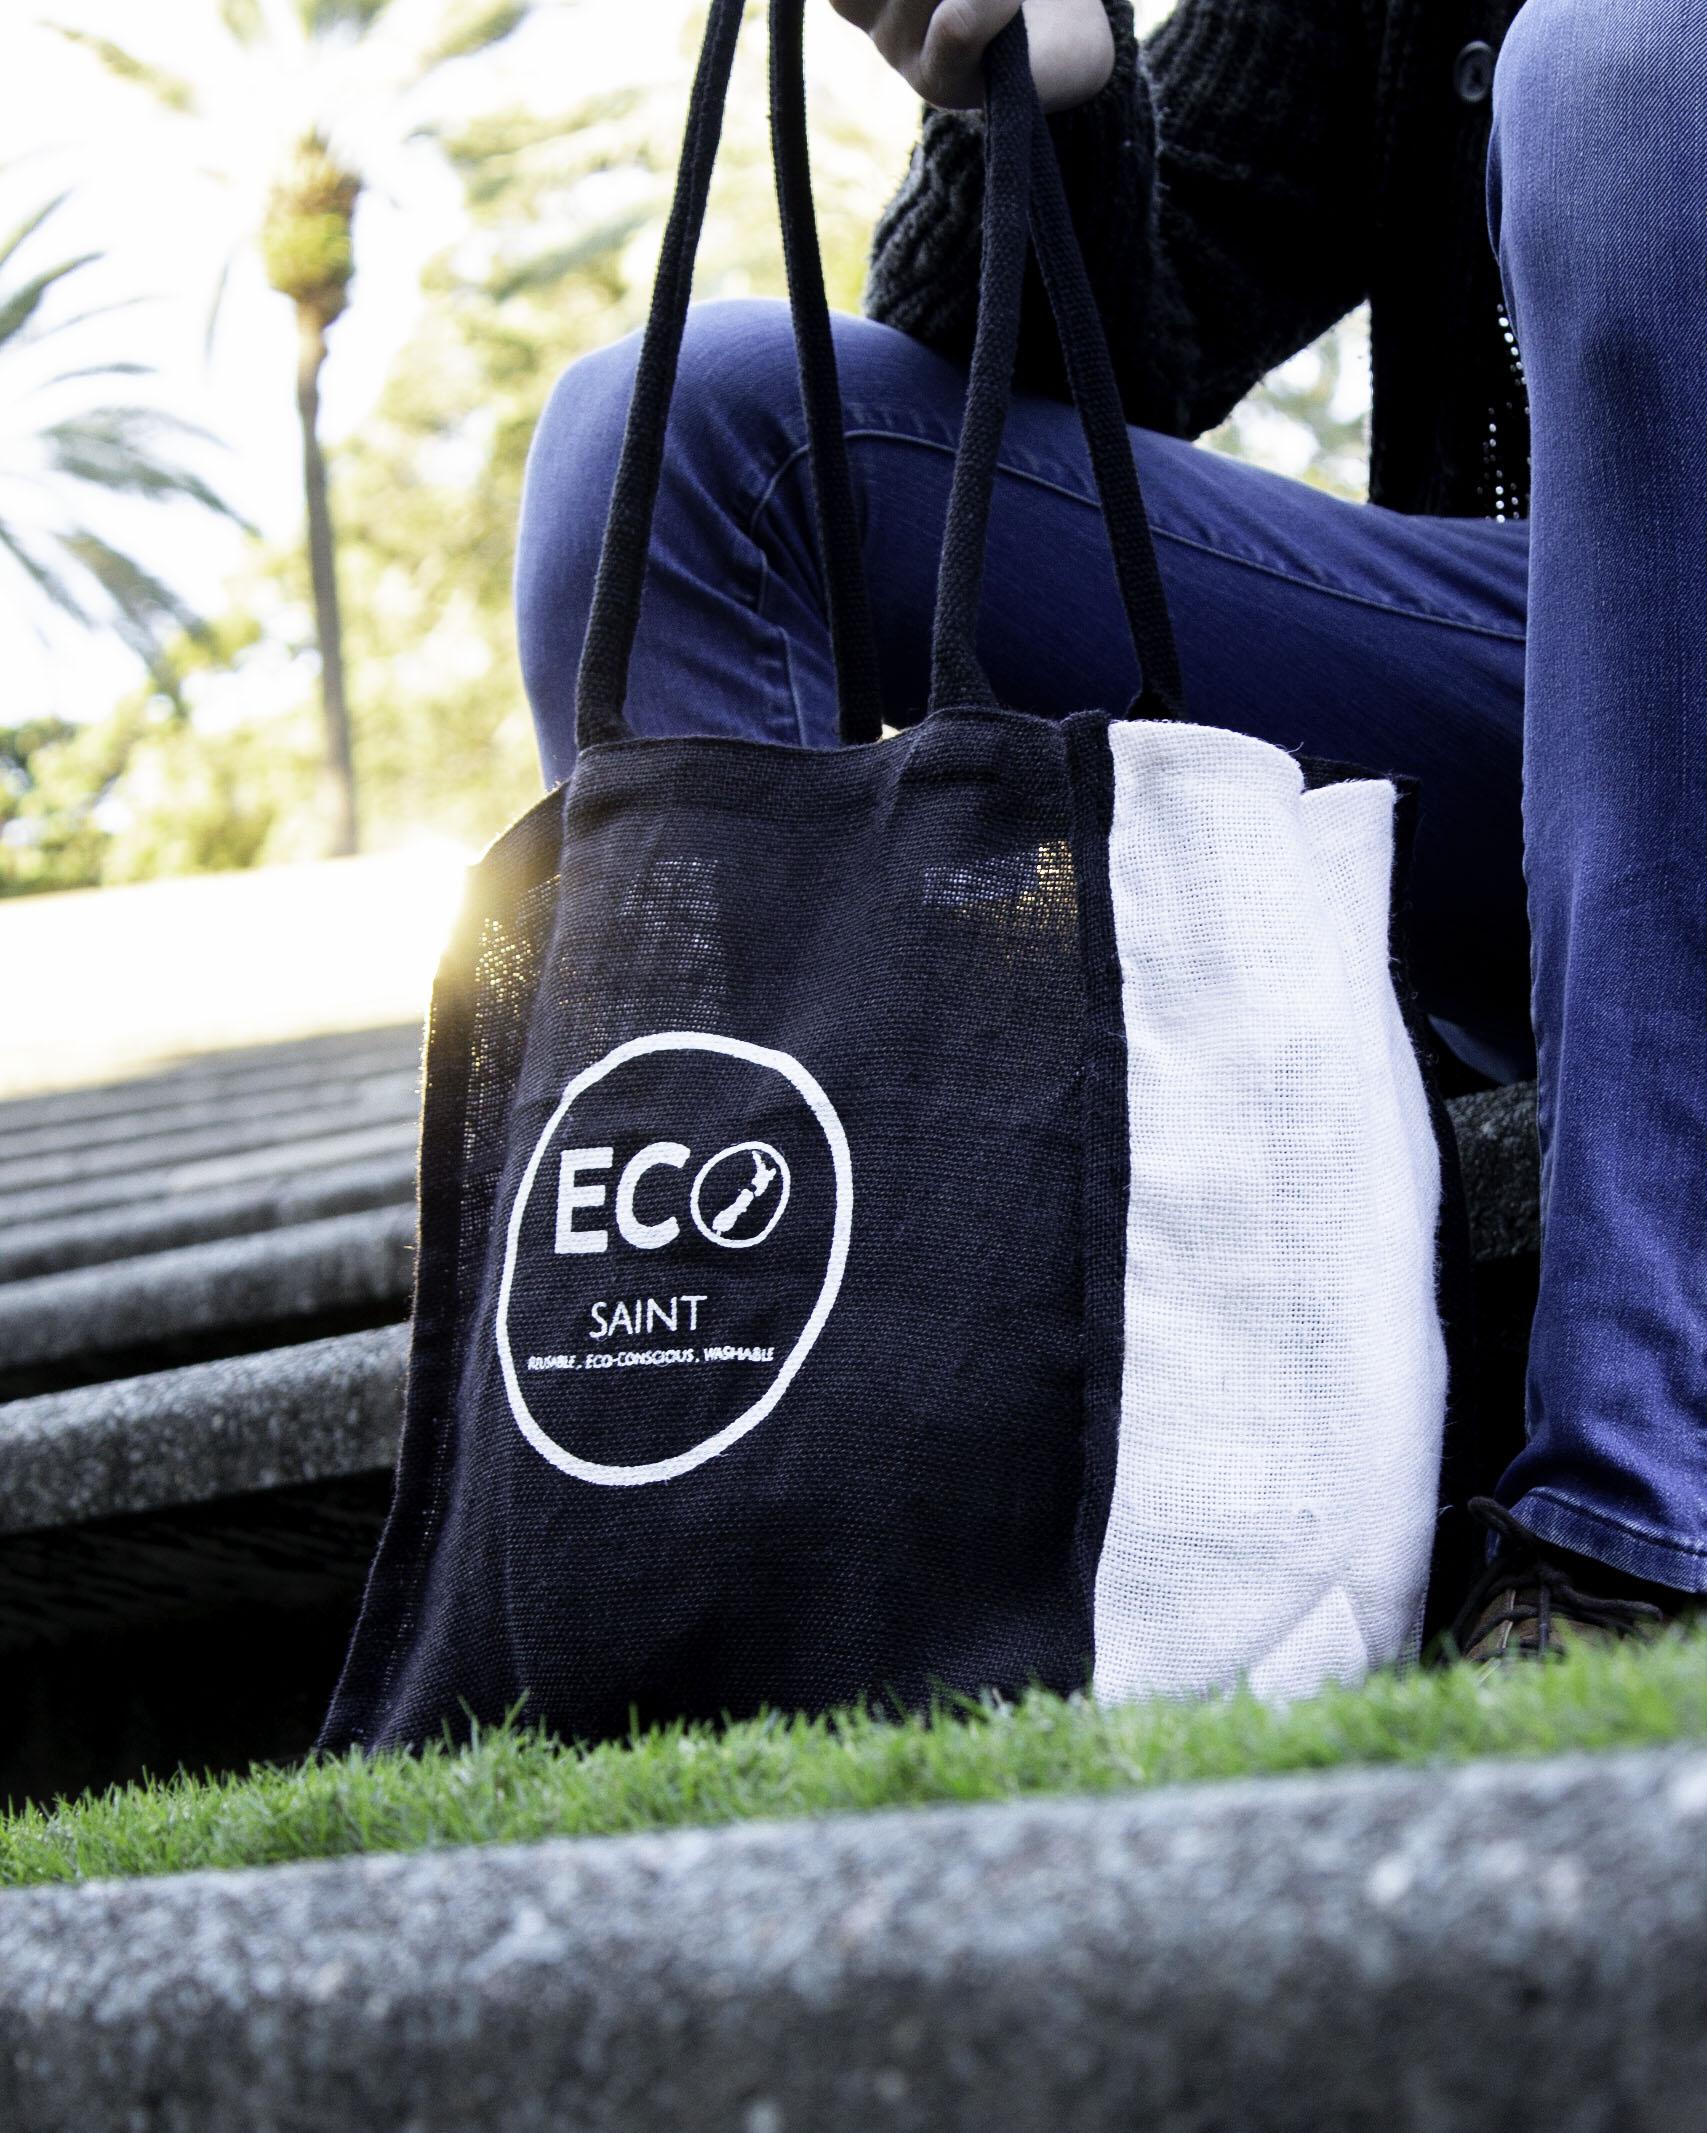 Eco Saint_11.jpg